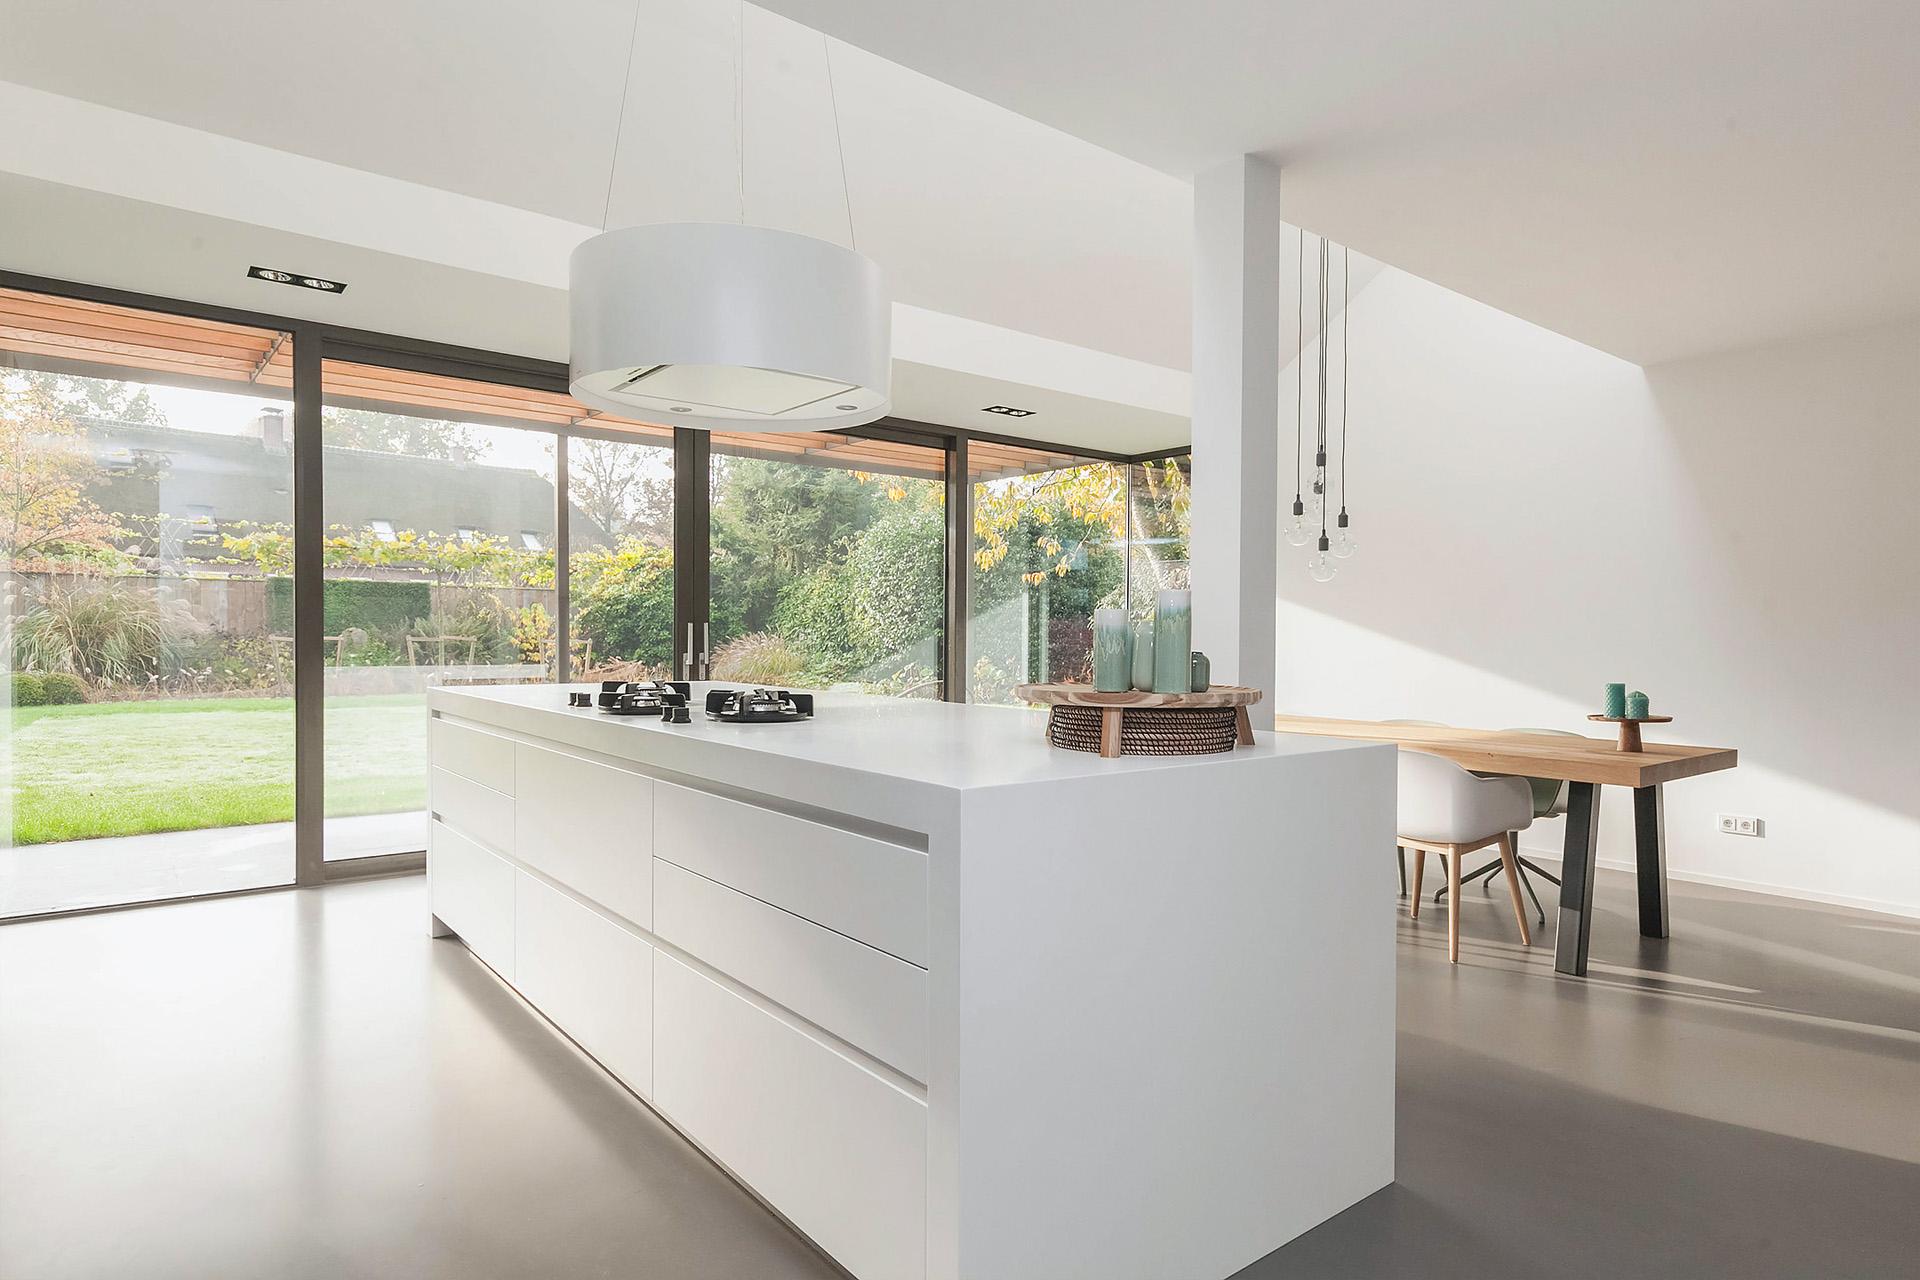 eva-helvoirt-keuken1